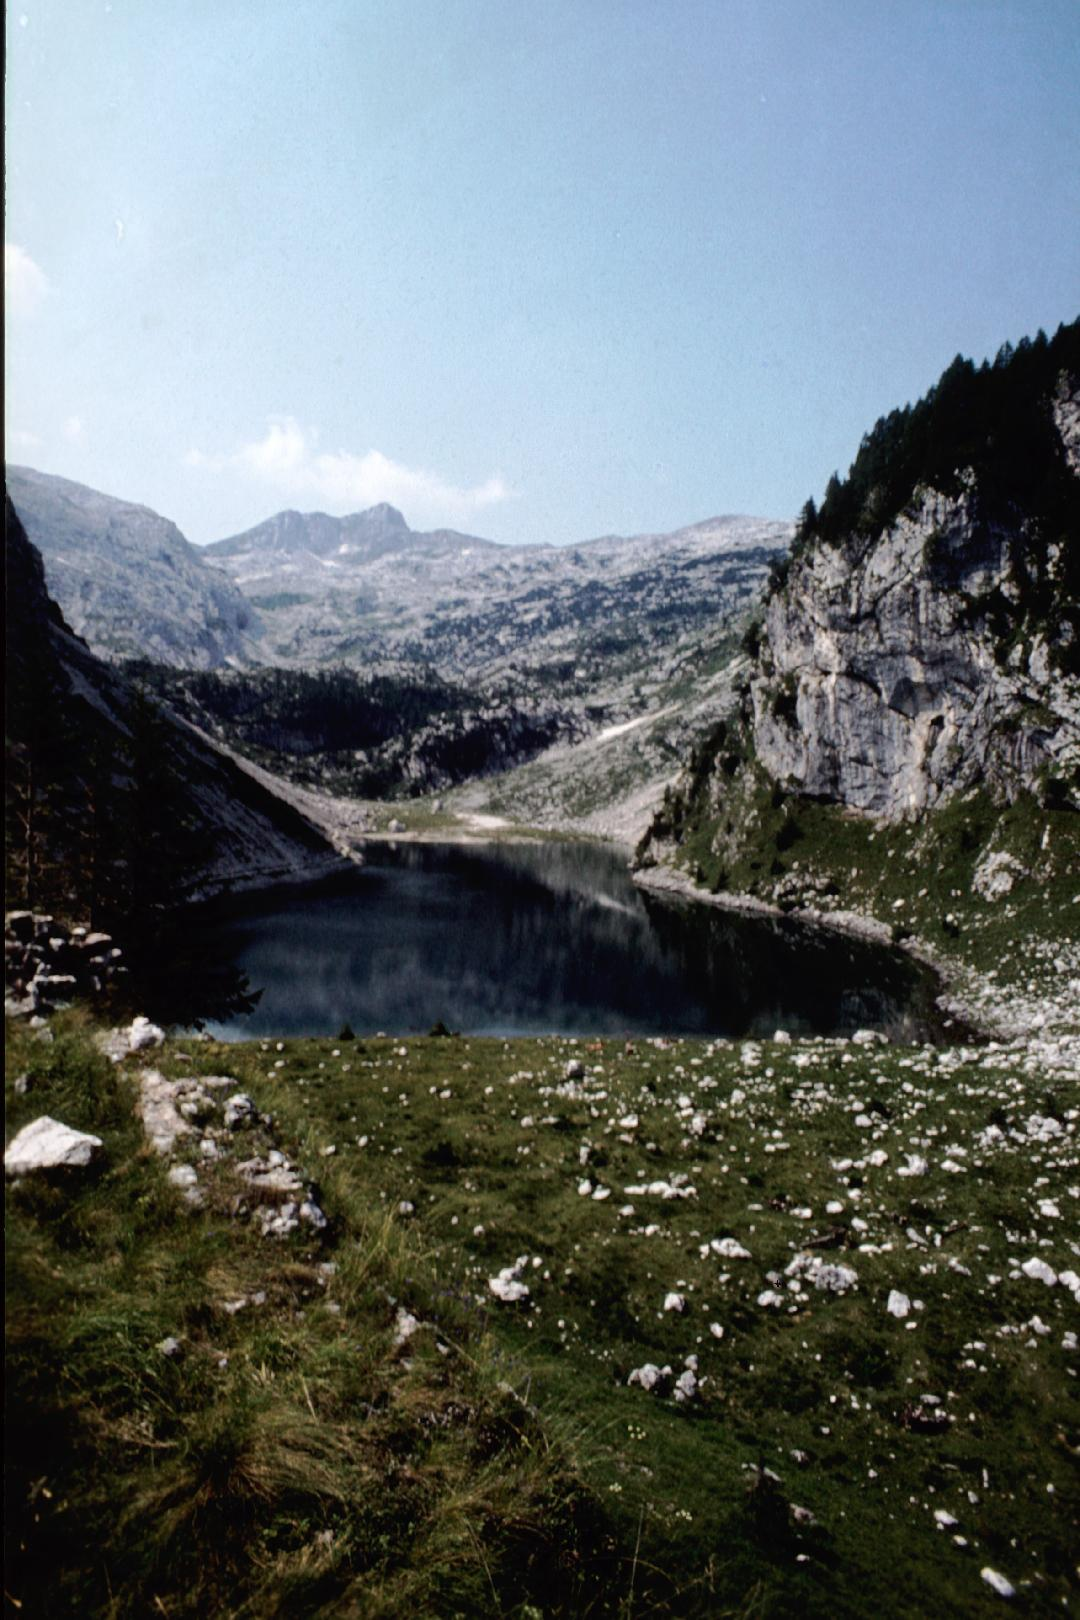 Predavanje Visokogorska jezera, v sedimentih zapisana zgodovina